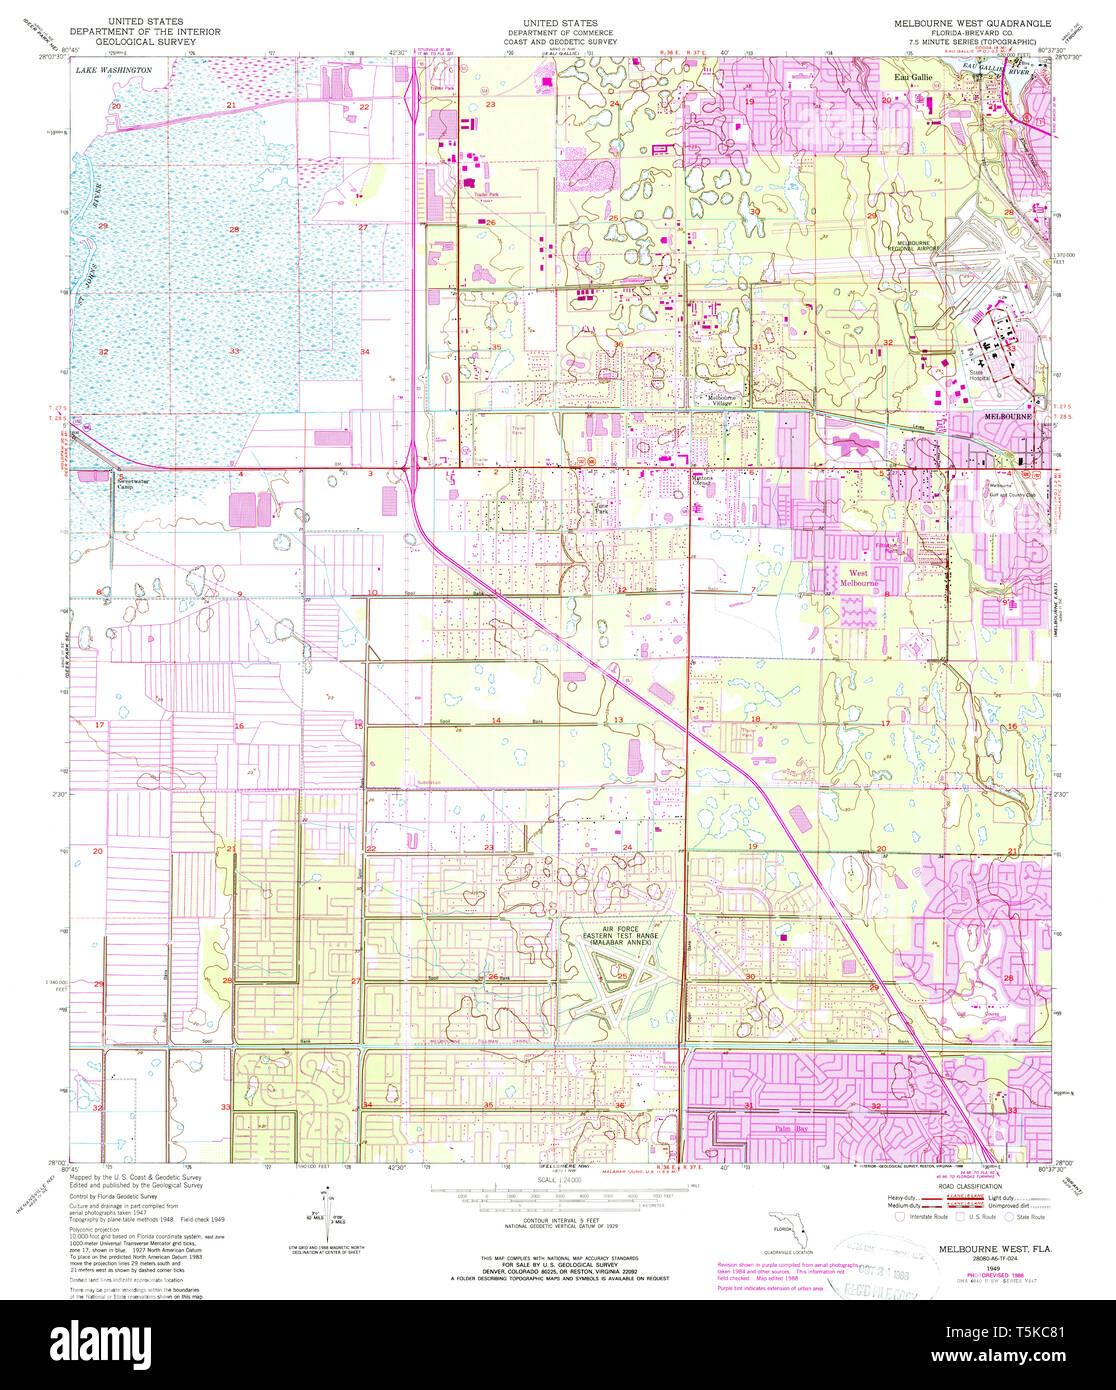 Map Of Florida Melbourne.Usgs Topo Map Florida Fl Melbourne West 347442 1949 24000